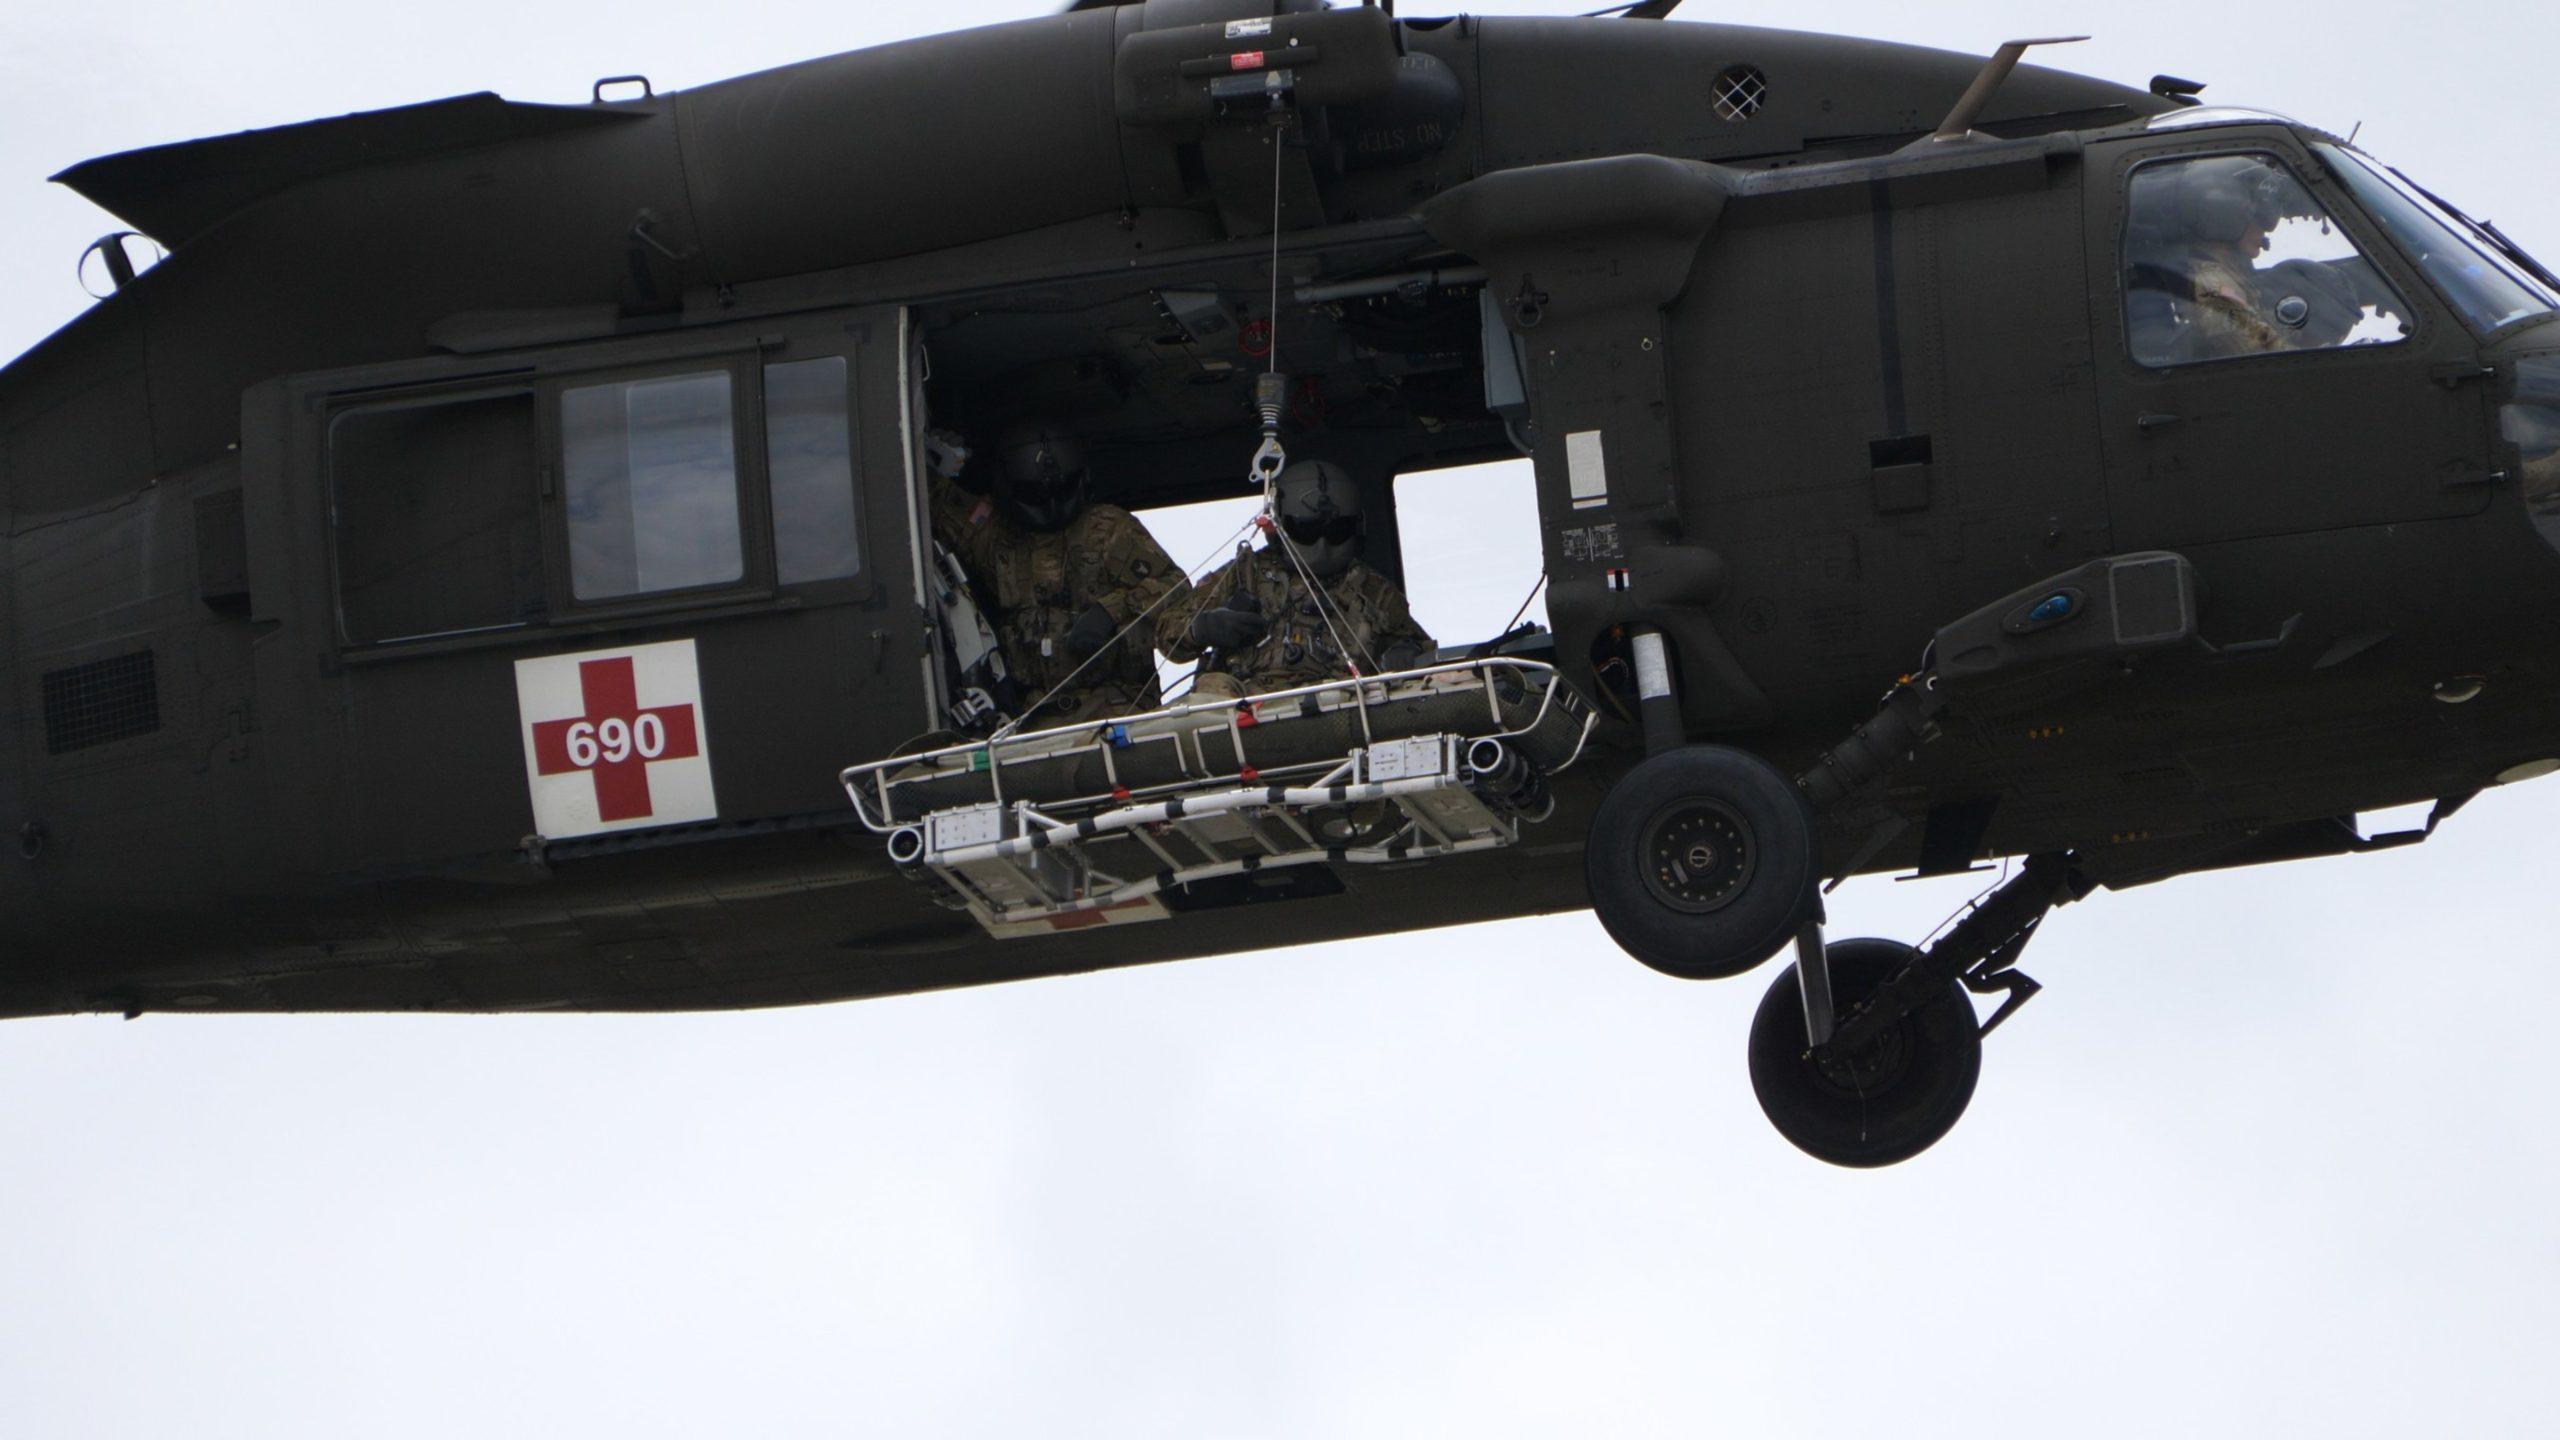 The Vita Rescue System Litter Attachment Under a Black Hawk Helicopter